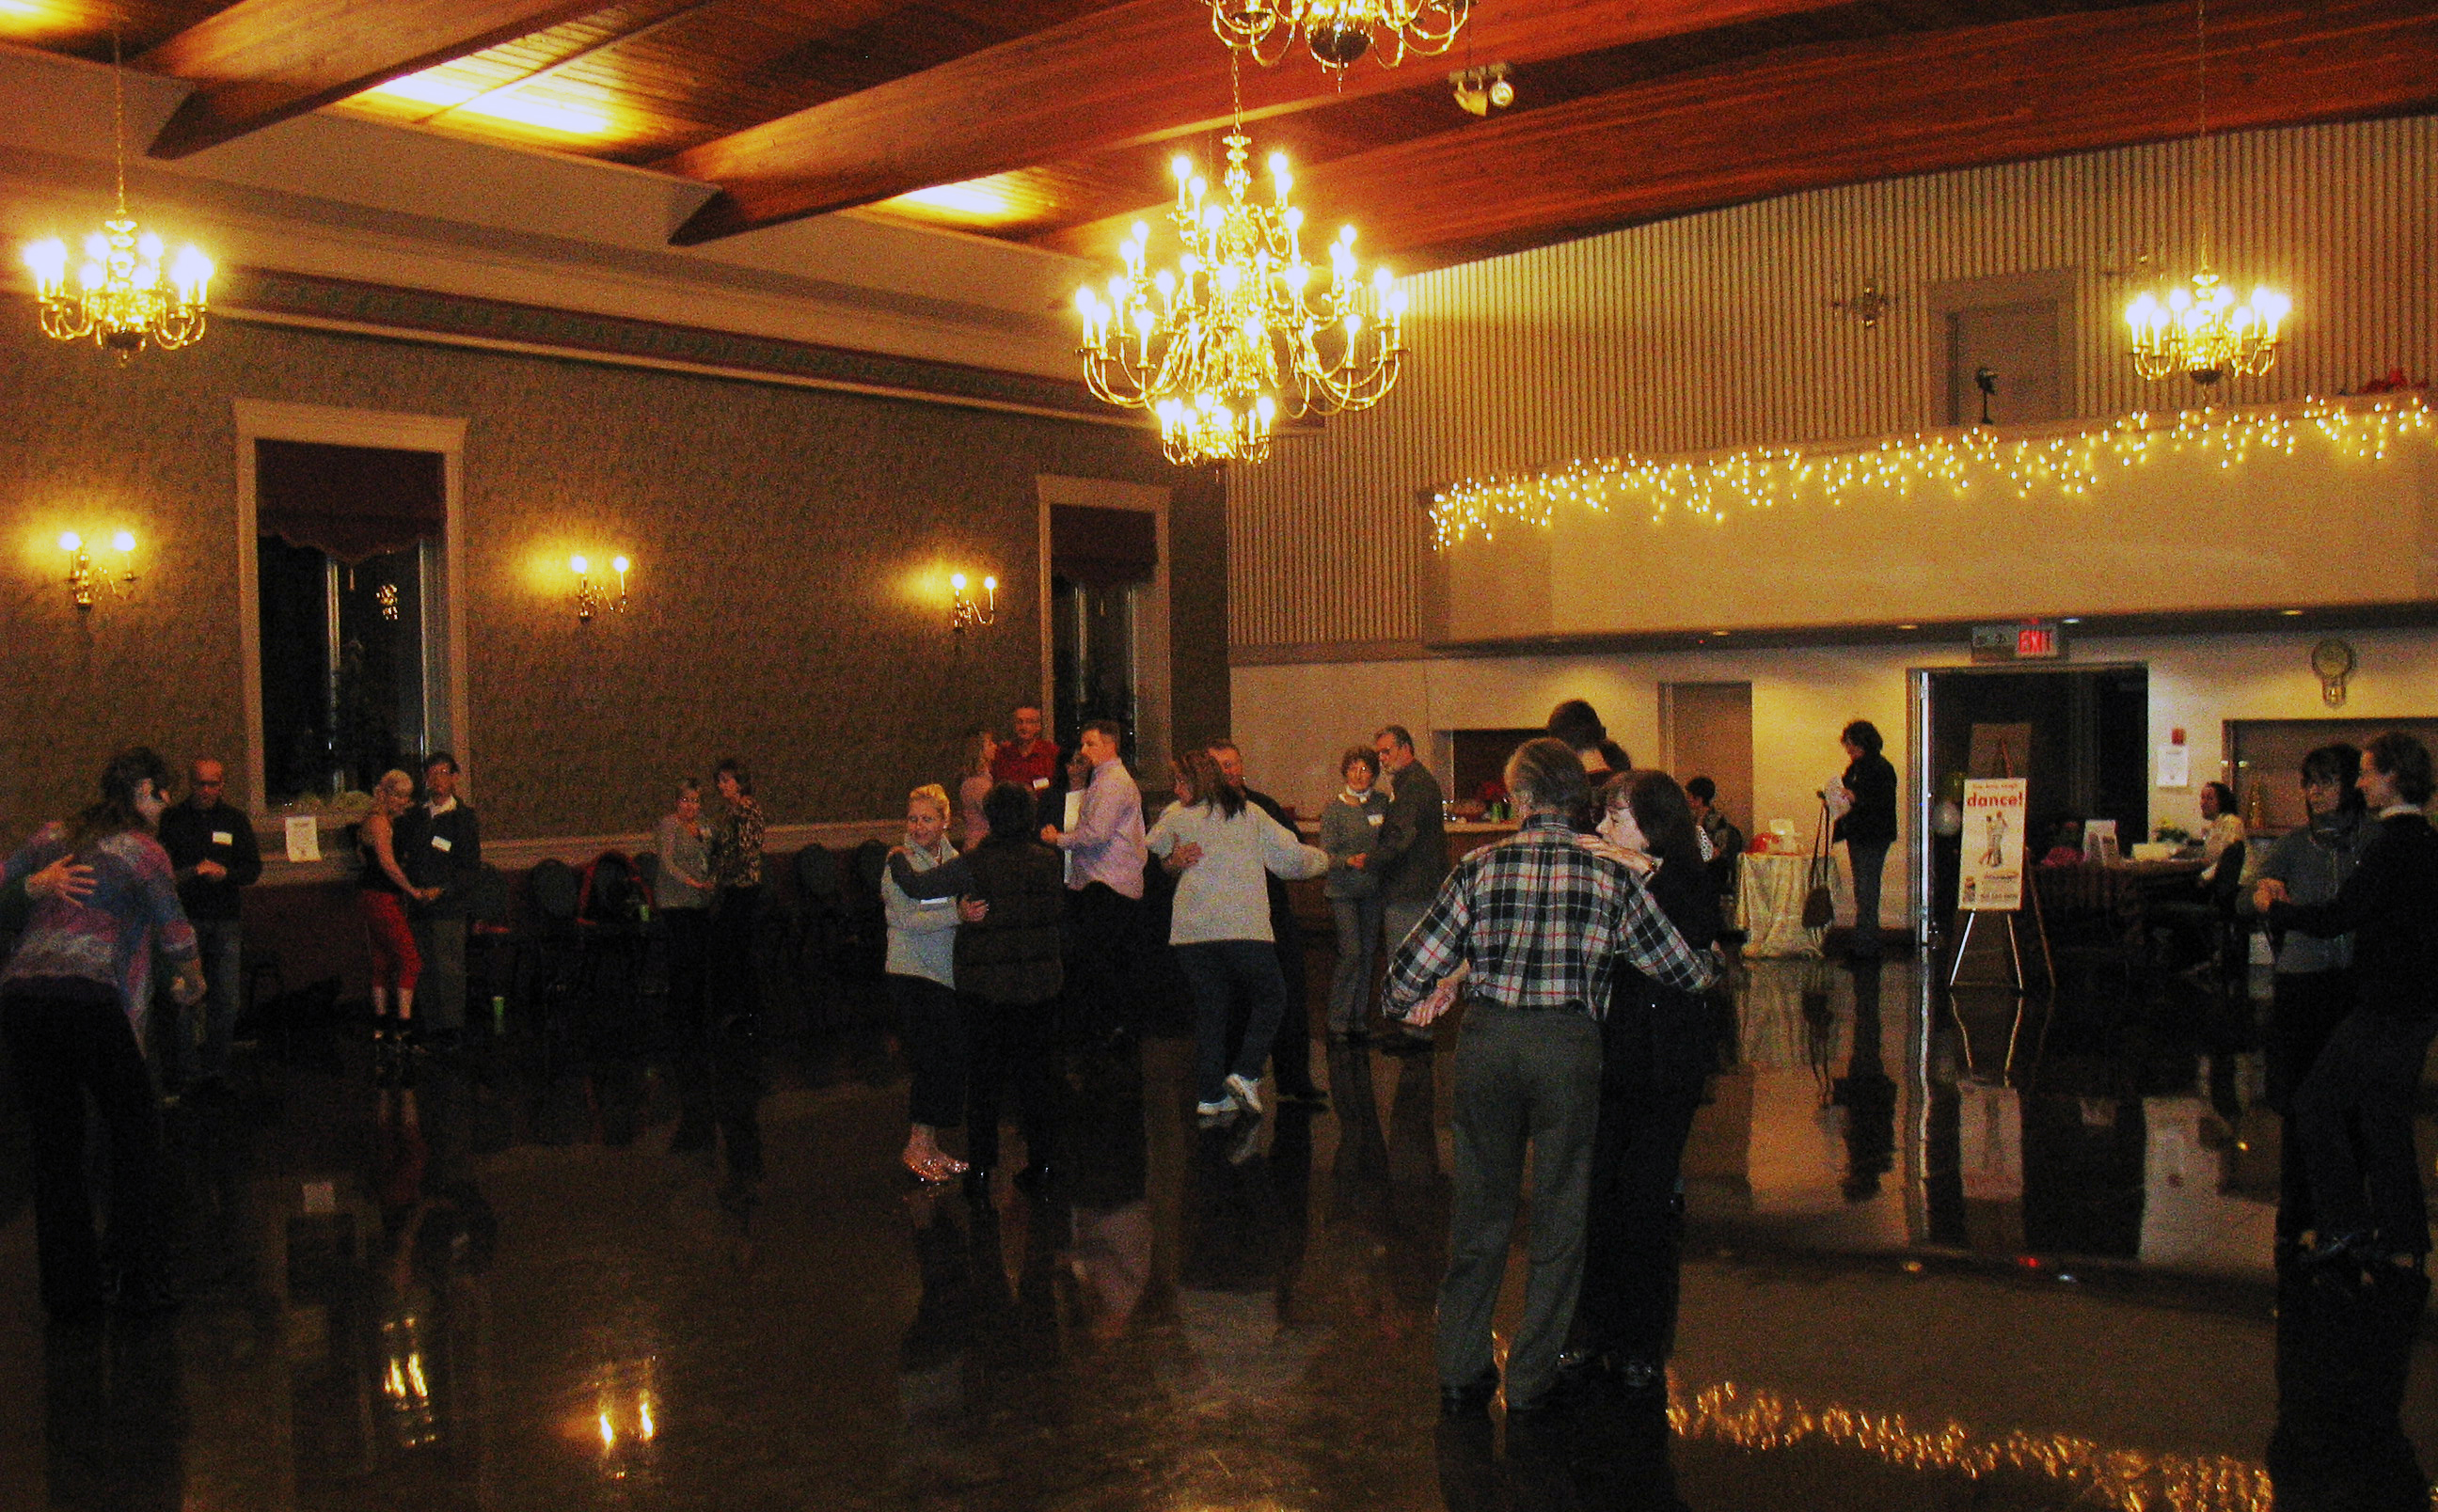 danceScape Open House – Ballroom, Salsa/Latin, danceTONE, Lindy Hop